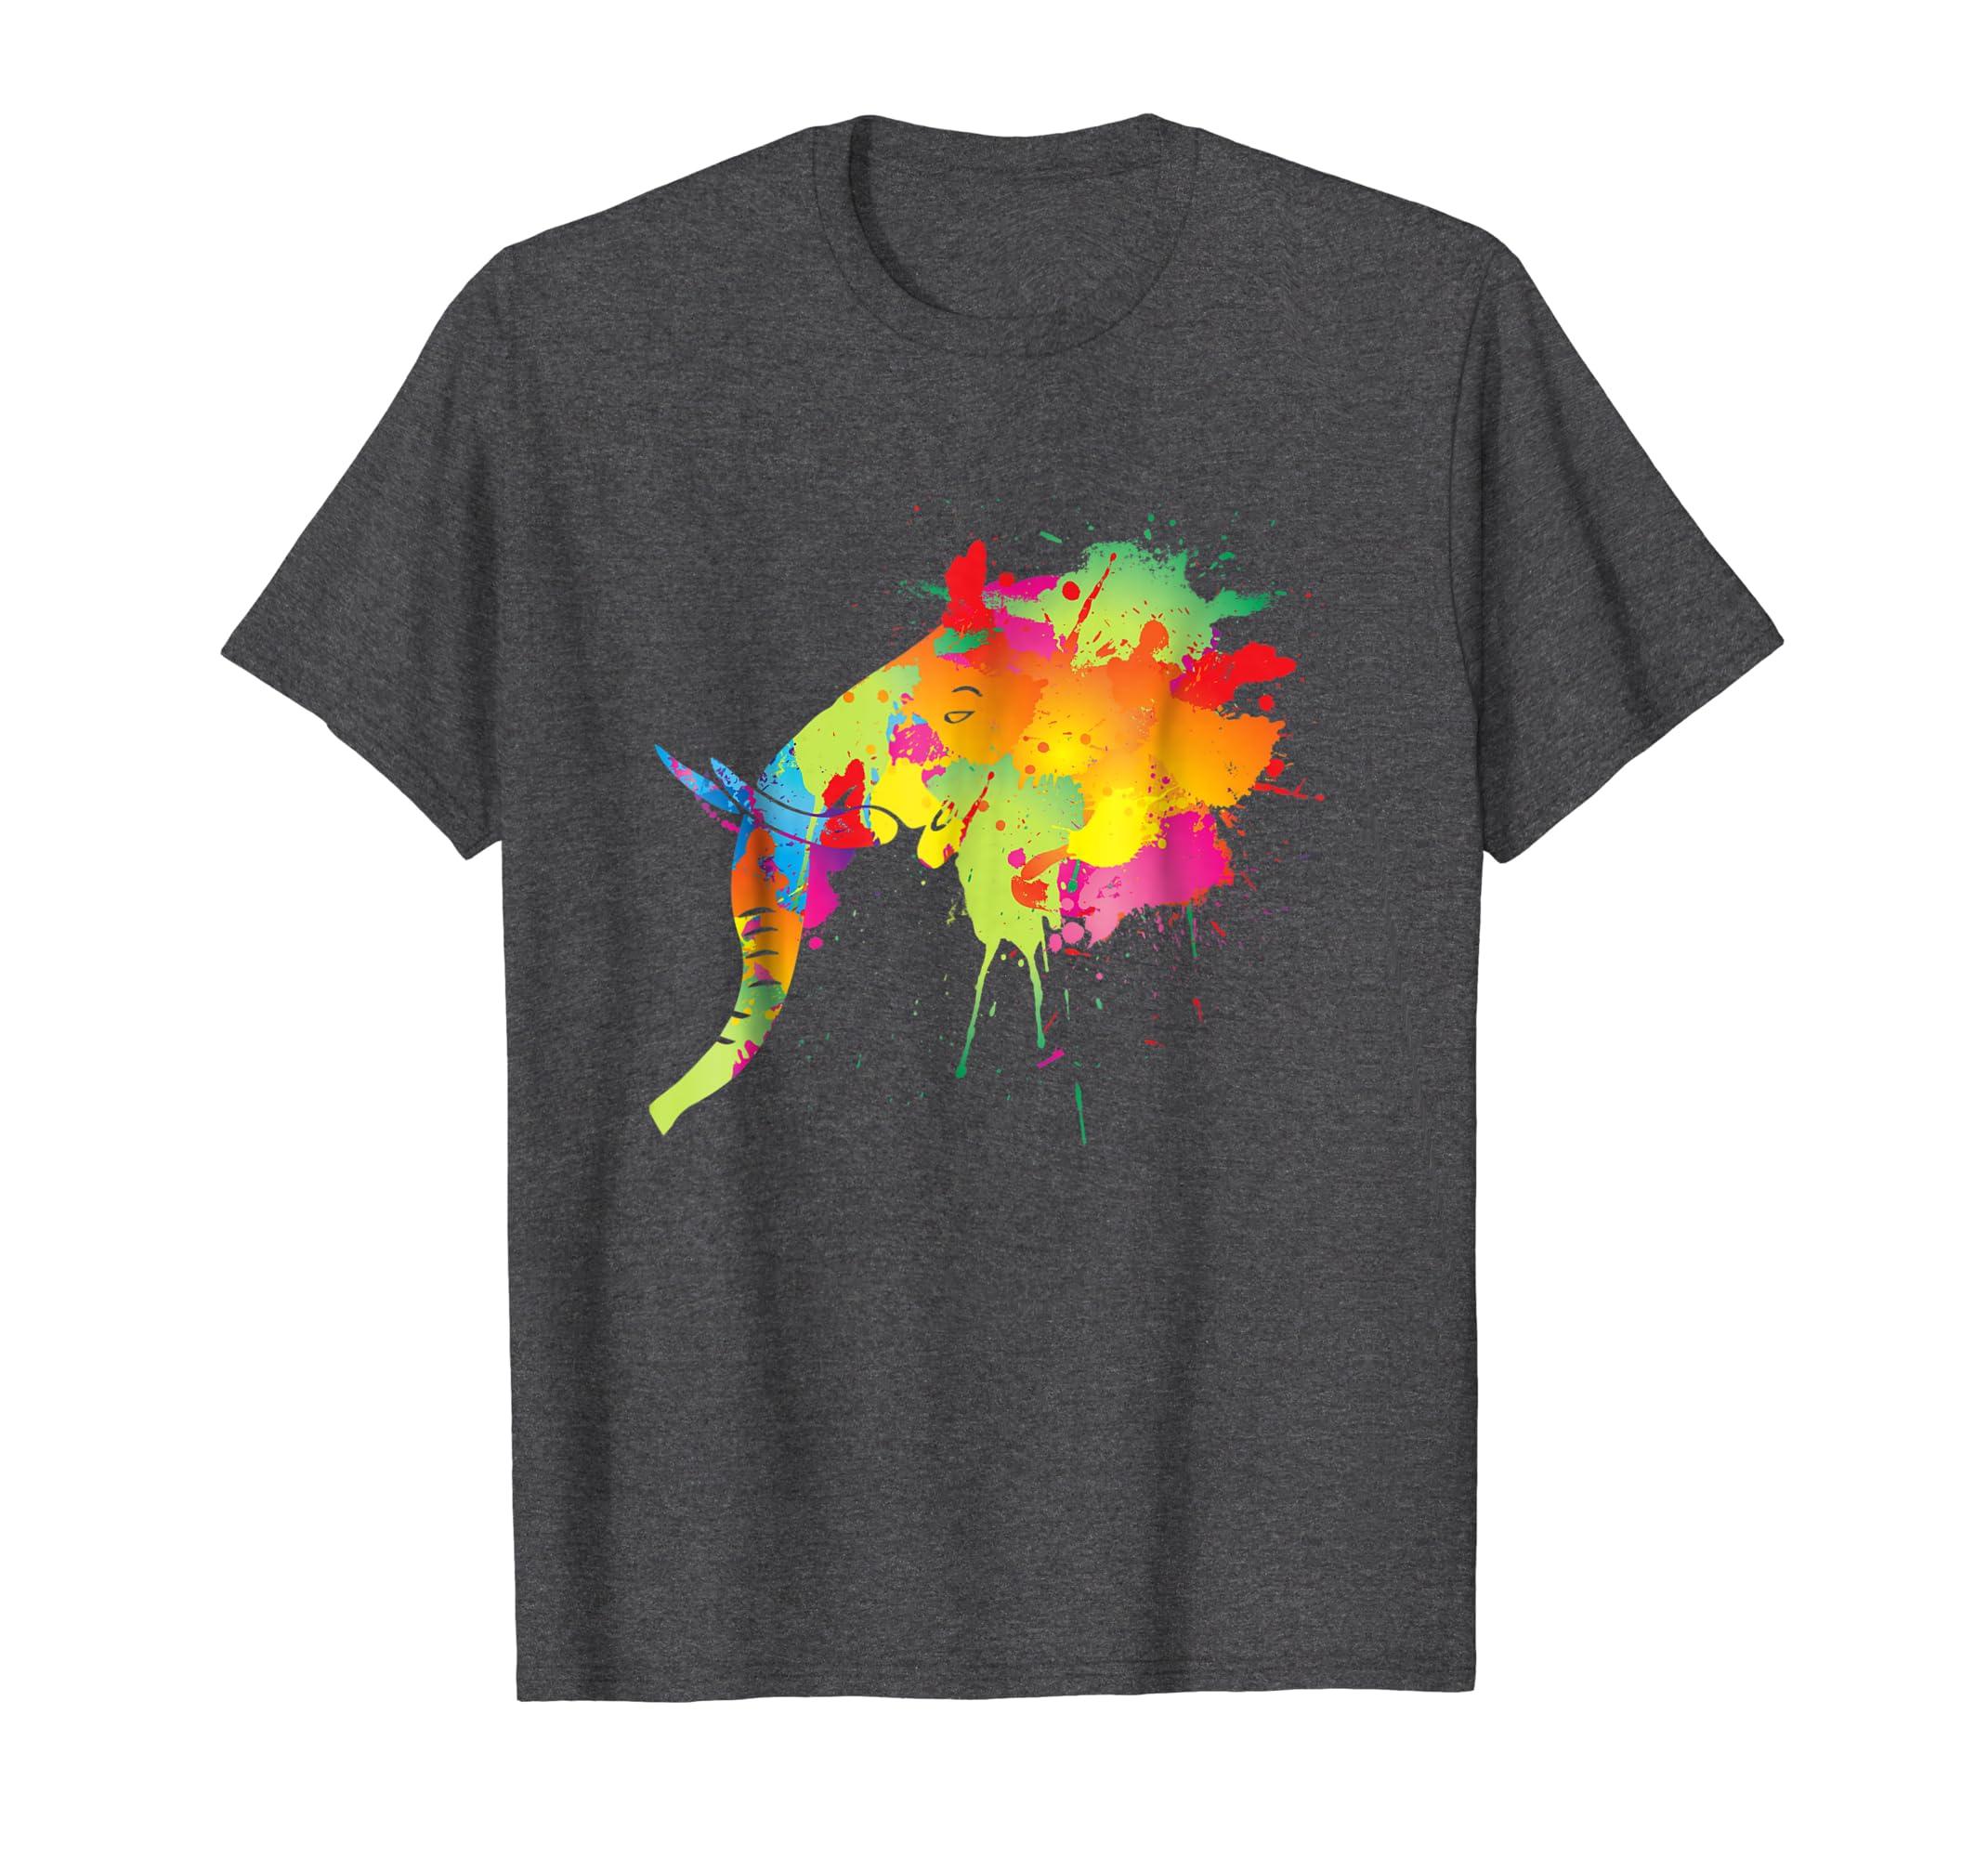 Elephant Gift Shirt Art Style Colorful Elephants Lover Tee